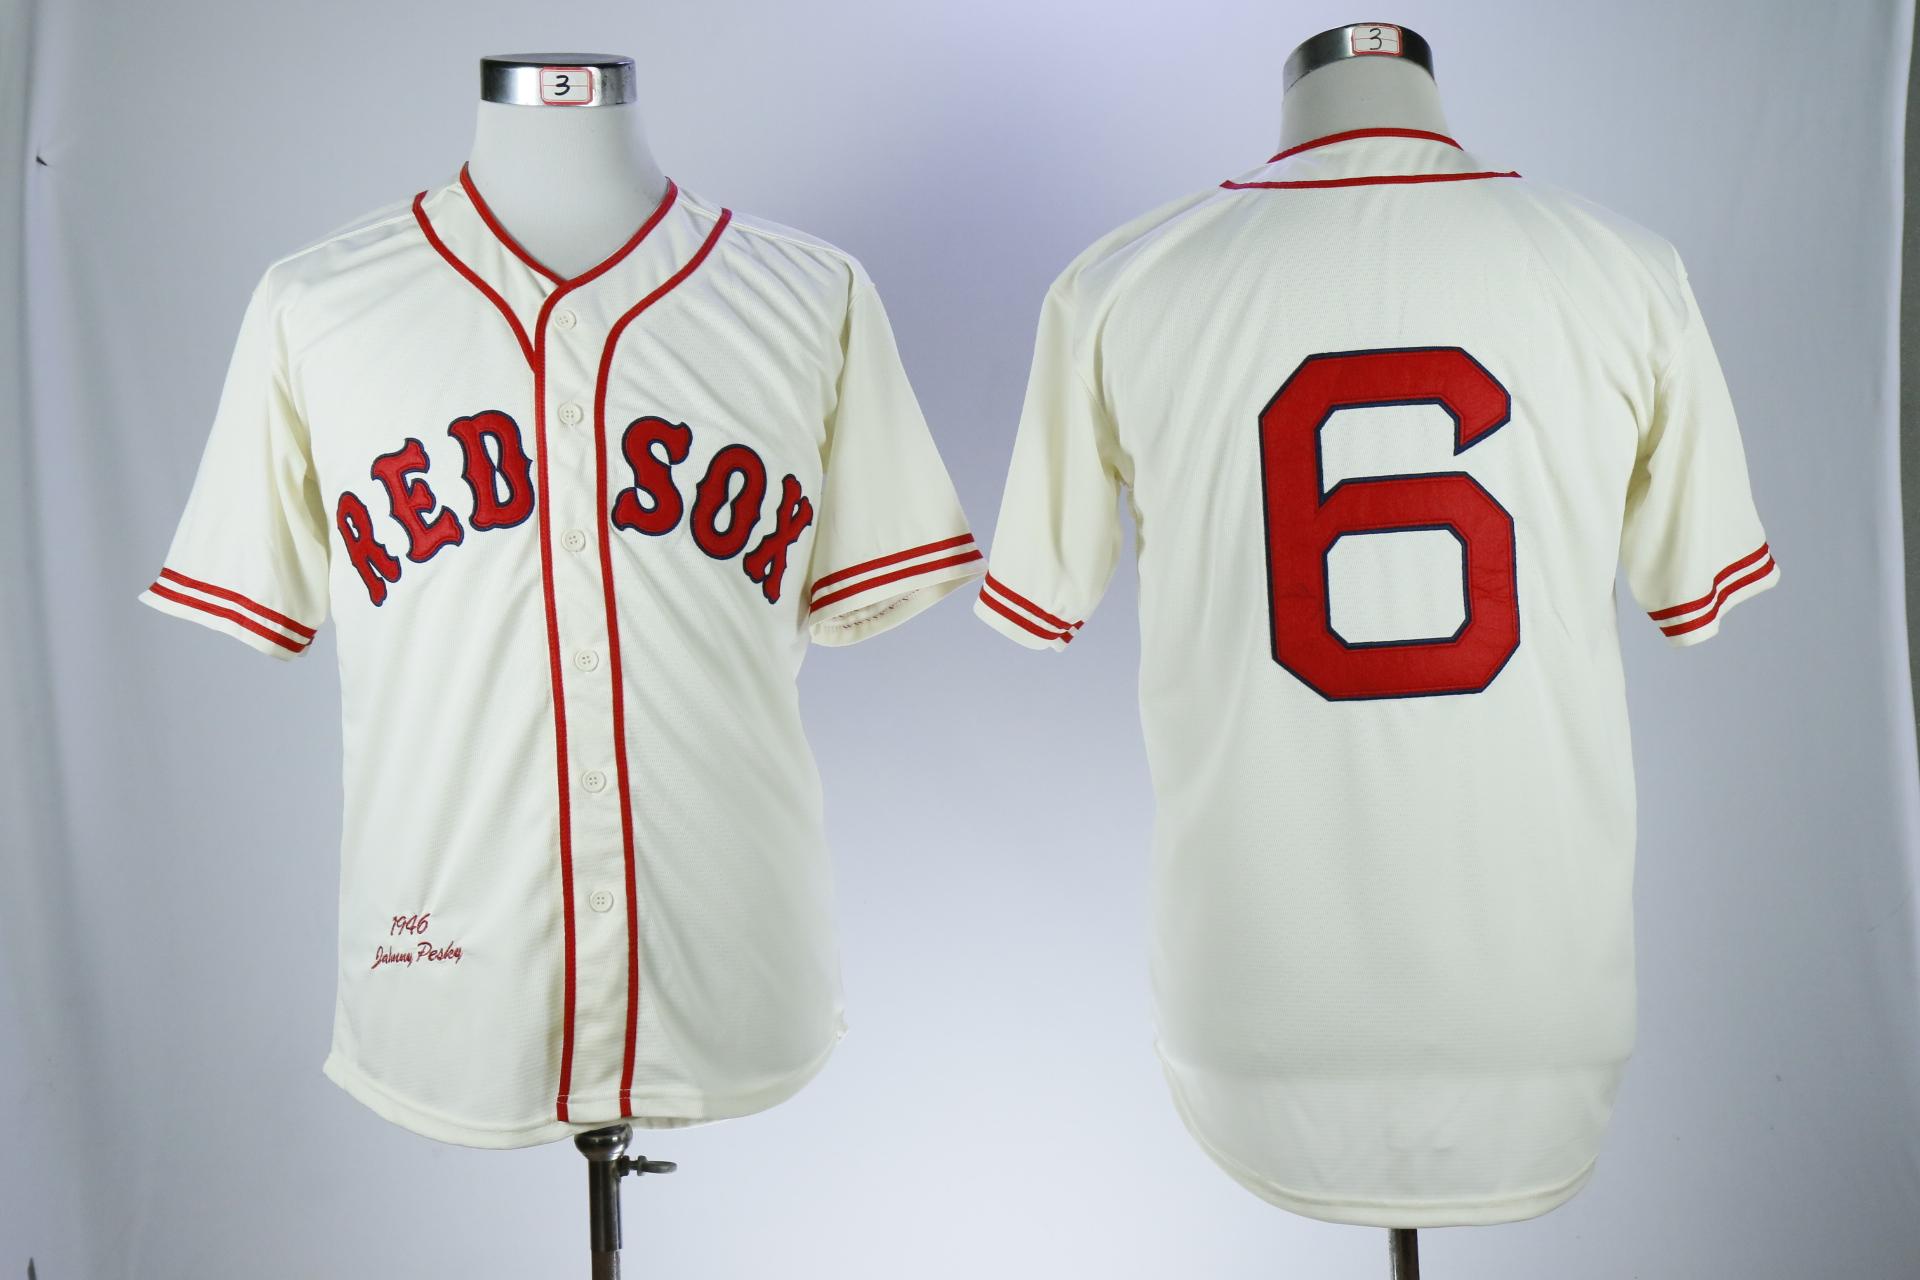 Red Sox 6 Johnny Pesky Cream 1946 Throwback Jersey